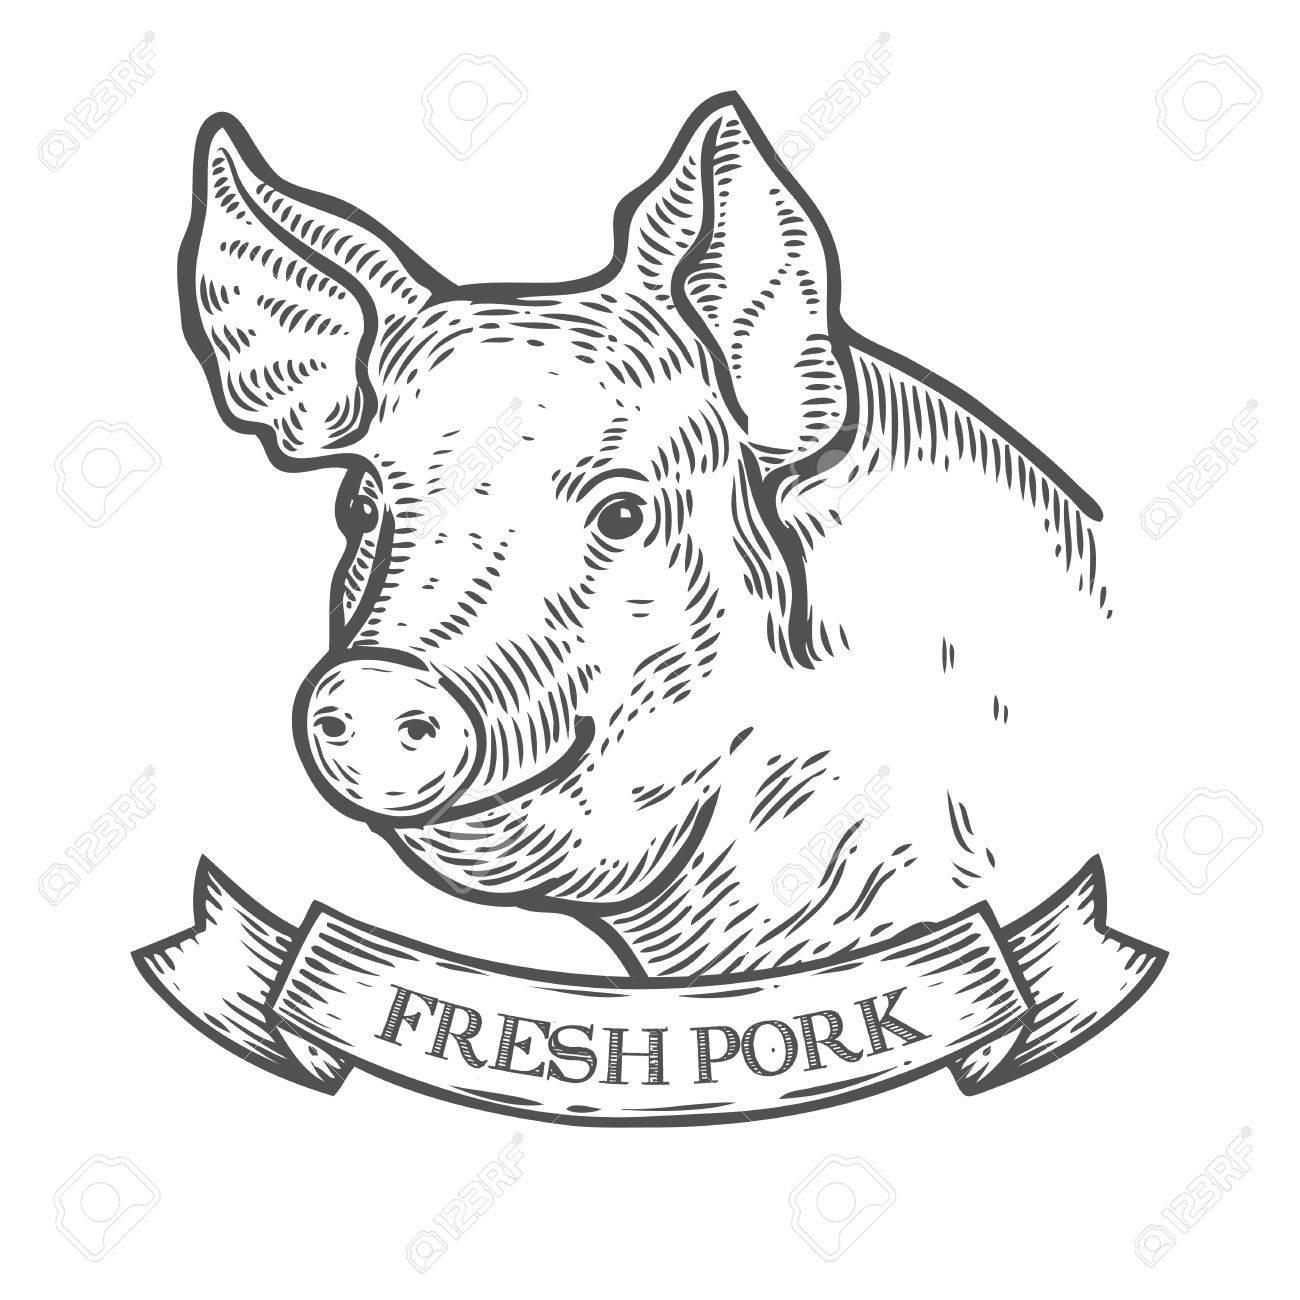 Pork Drawing At Getdrawings